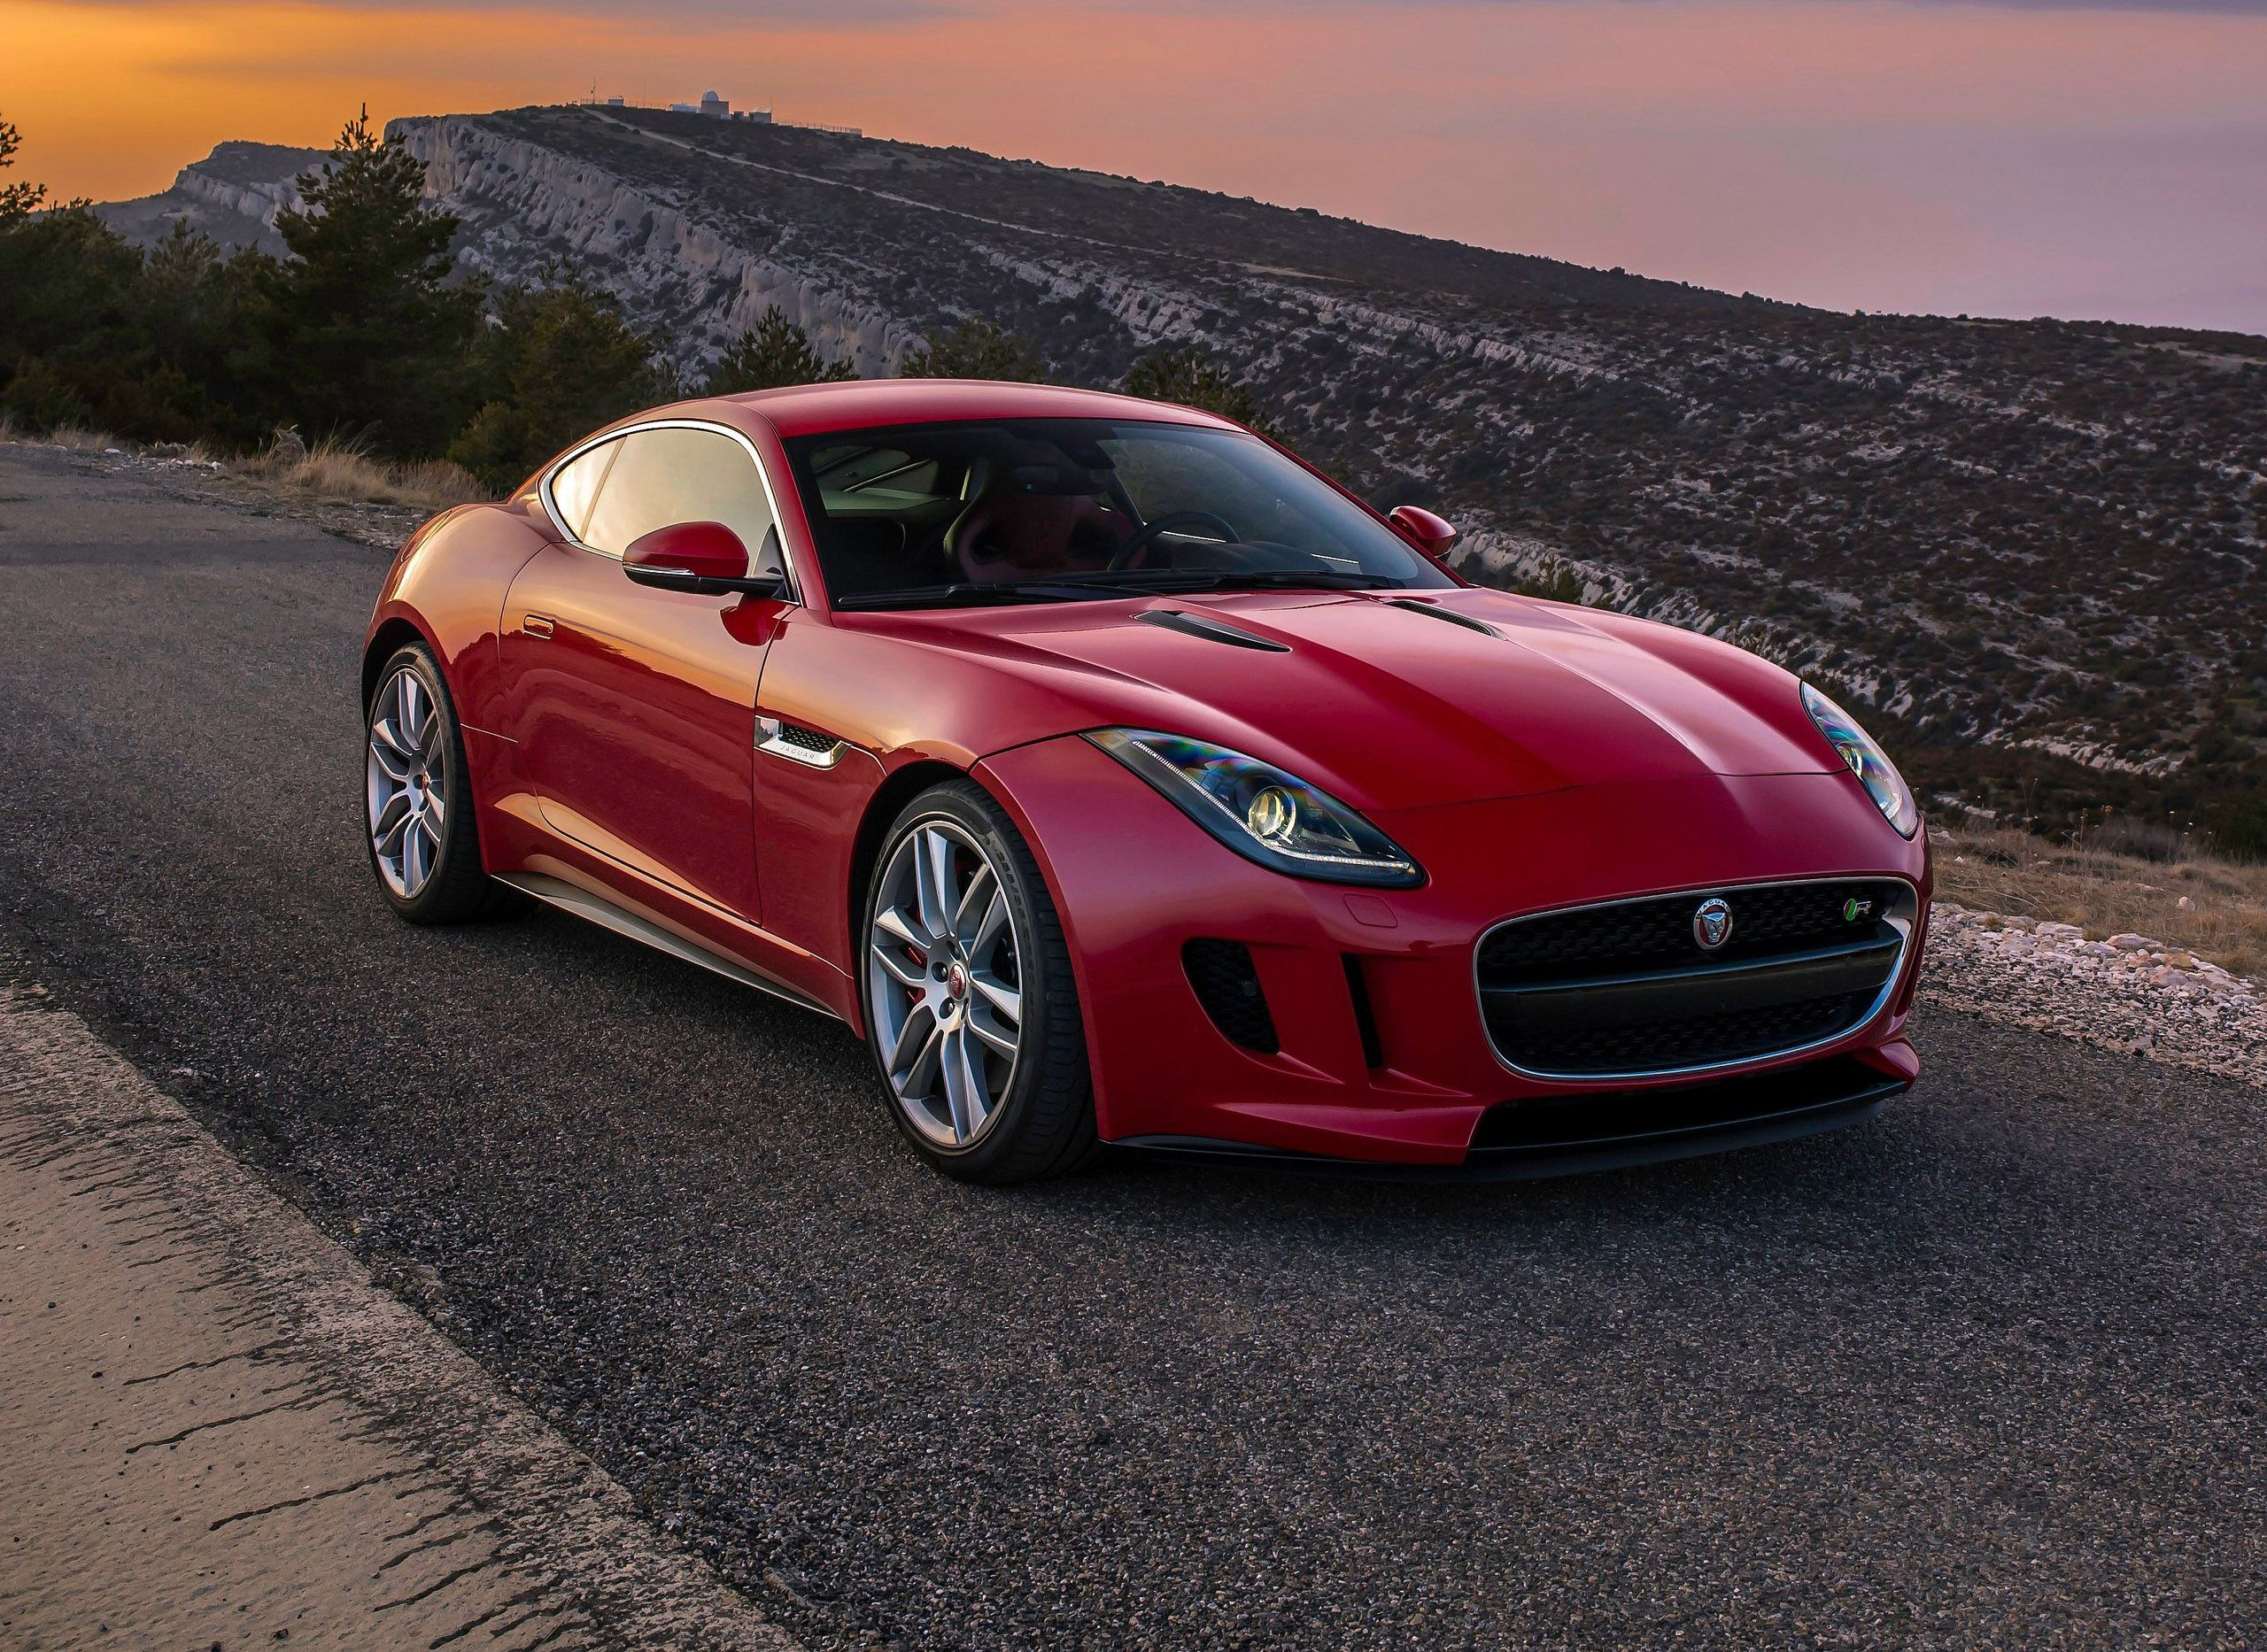 55 Best Free Jaguar Sports Car Wallpapers Wallpaperaccess